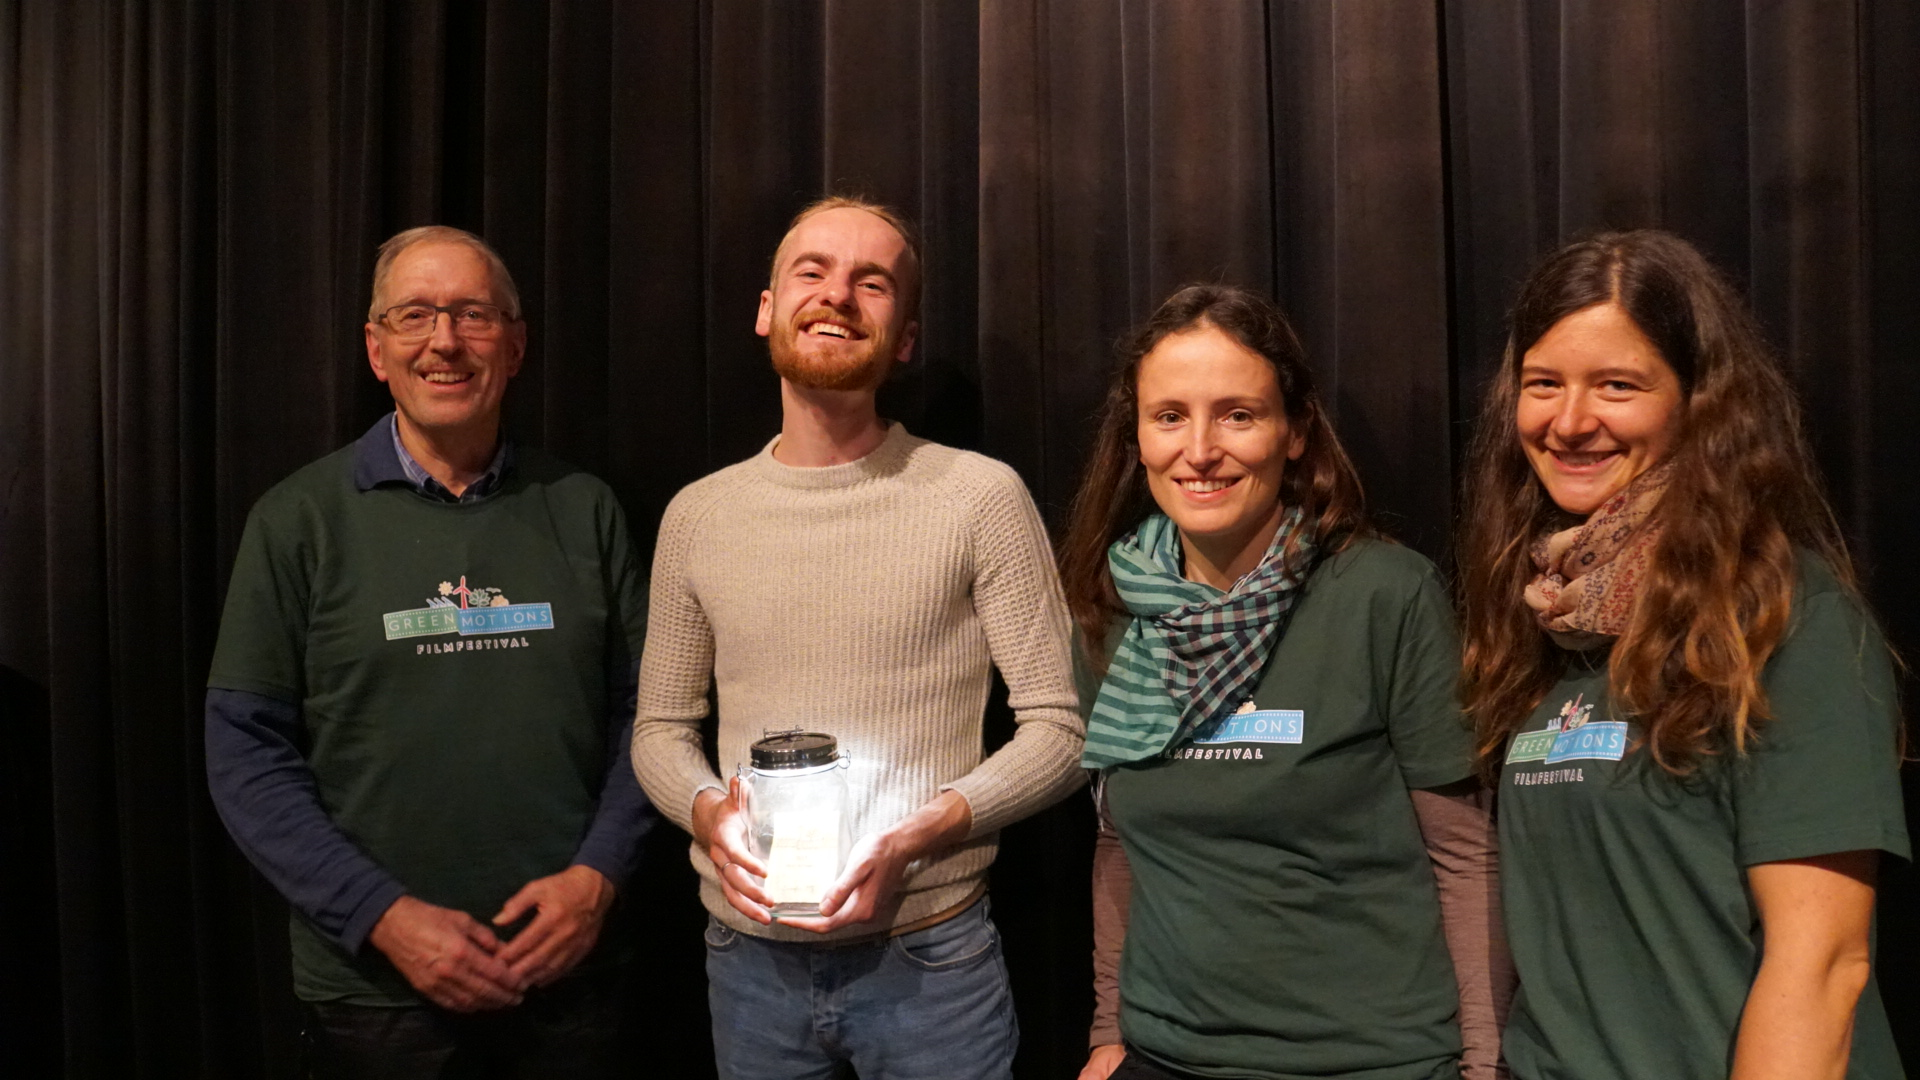 Georg Löser (Ecotrinova e.V.), Kurzfilmwettbewerbsgewinner Ignat Kachan (Under the Canopy of trees), Julie Elbert & Daniela Schaffart (Greenmotions e.V.)